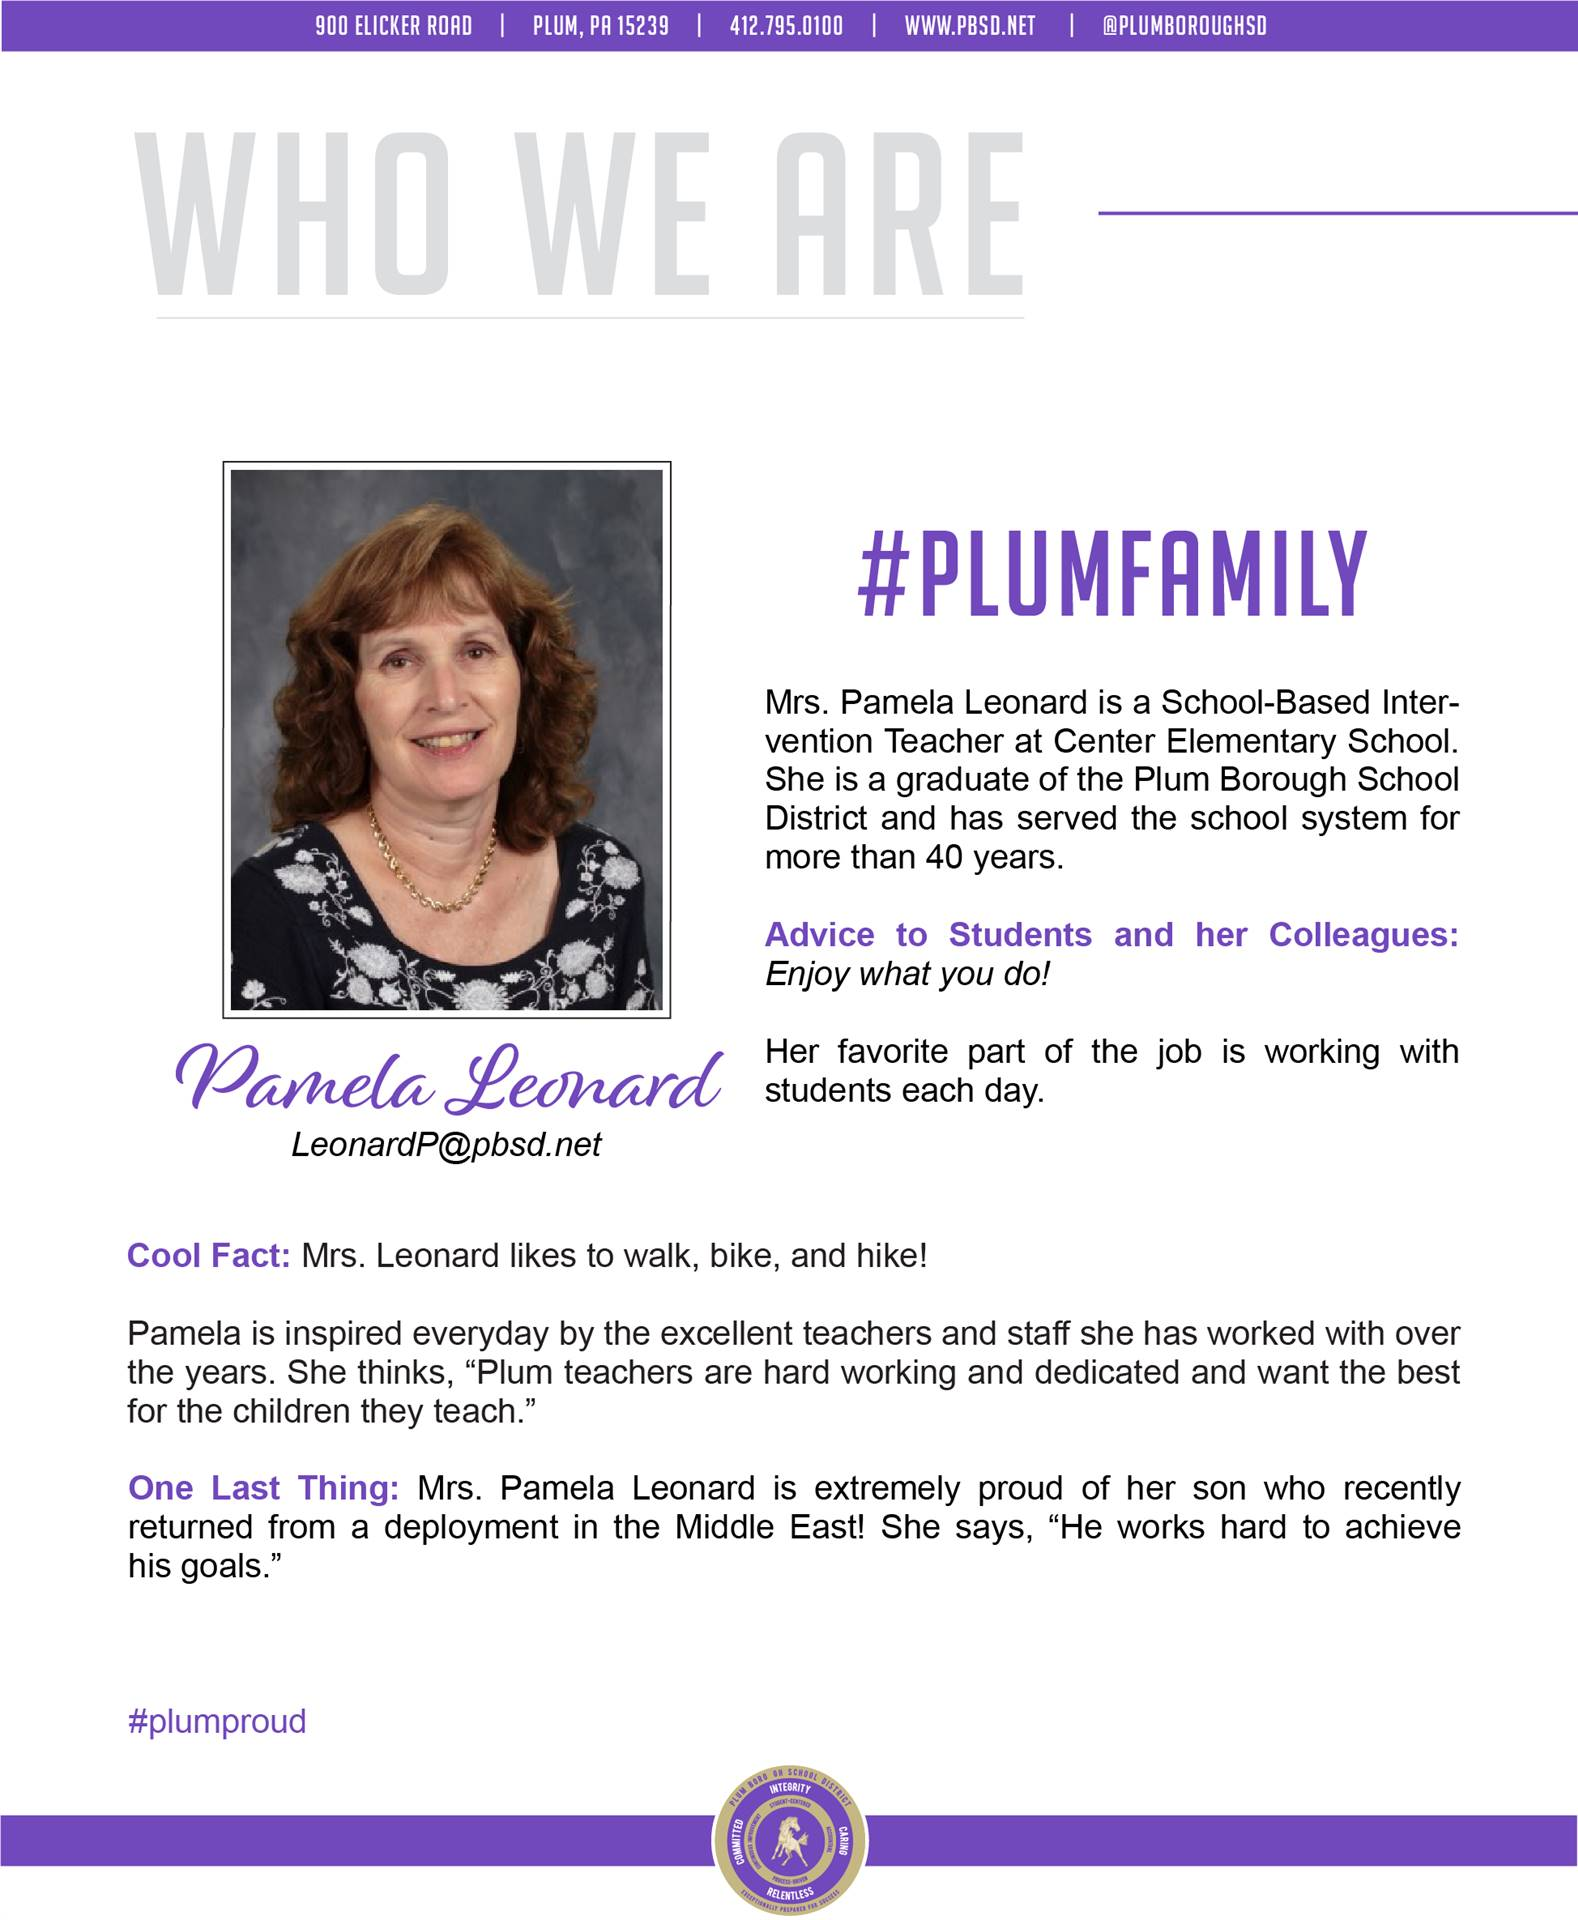 Who We Are Wednesday features Pamela Leonard.